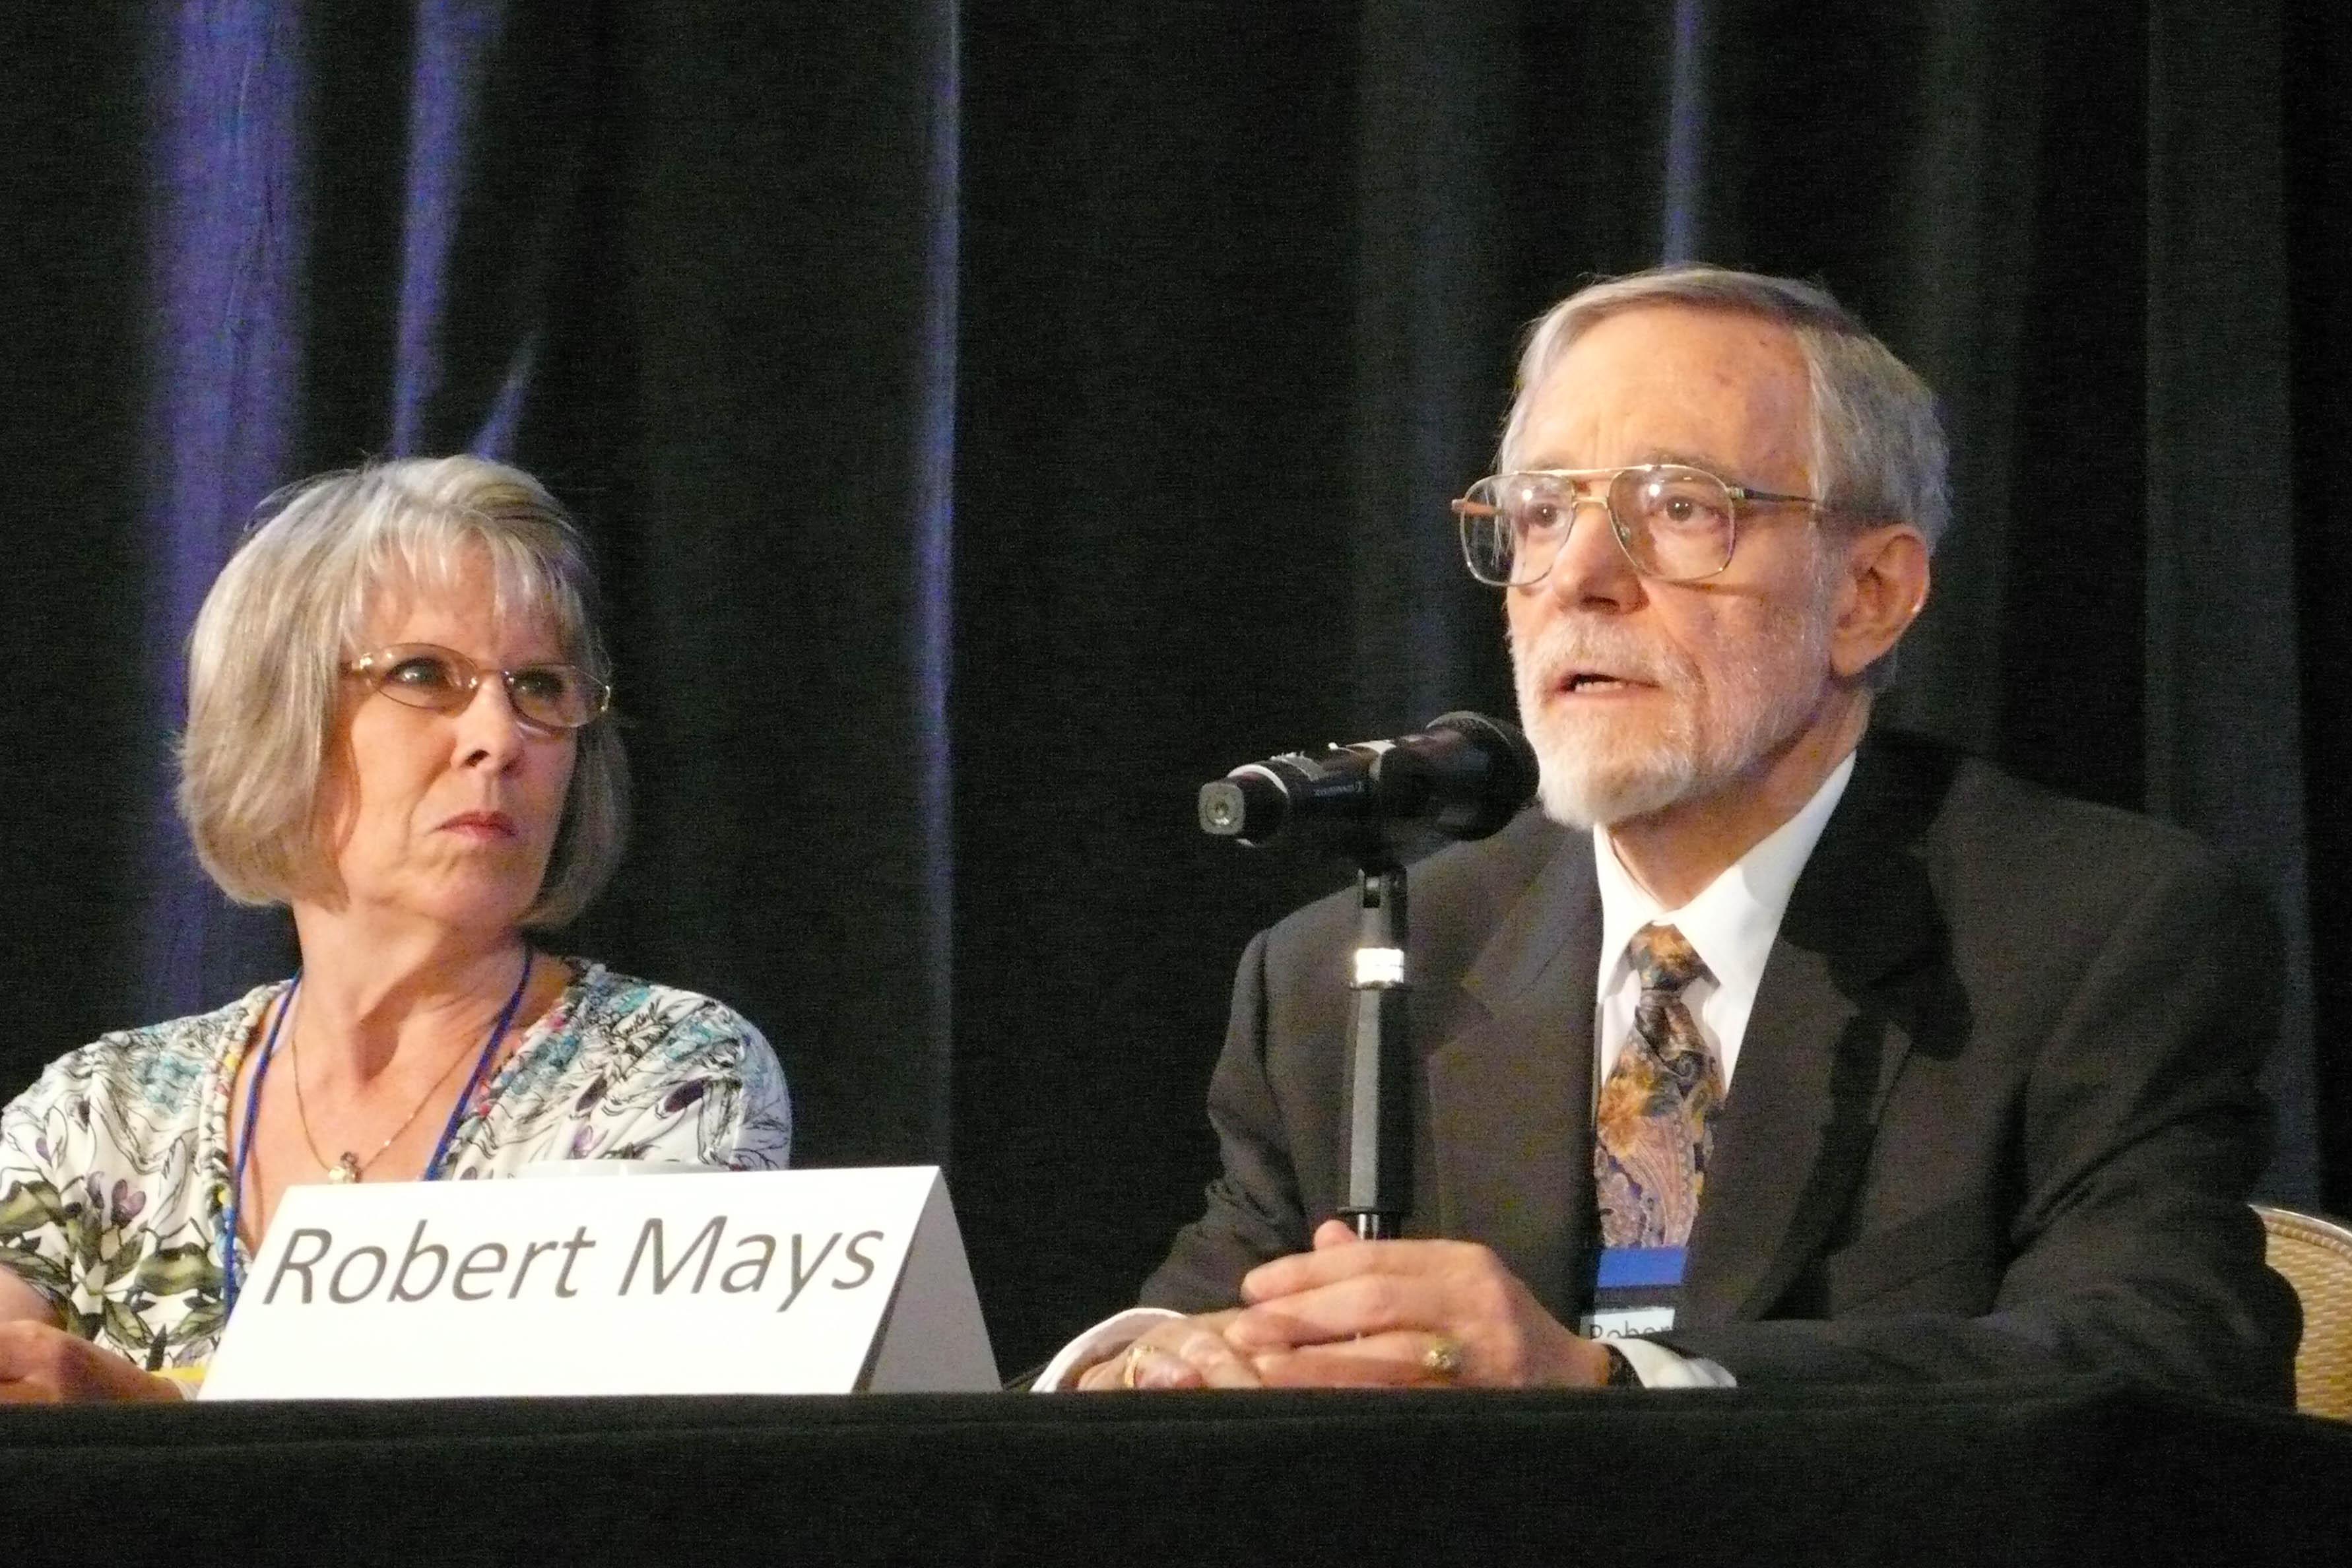 Robert Mays